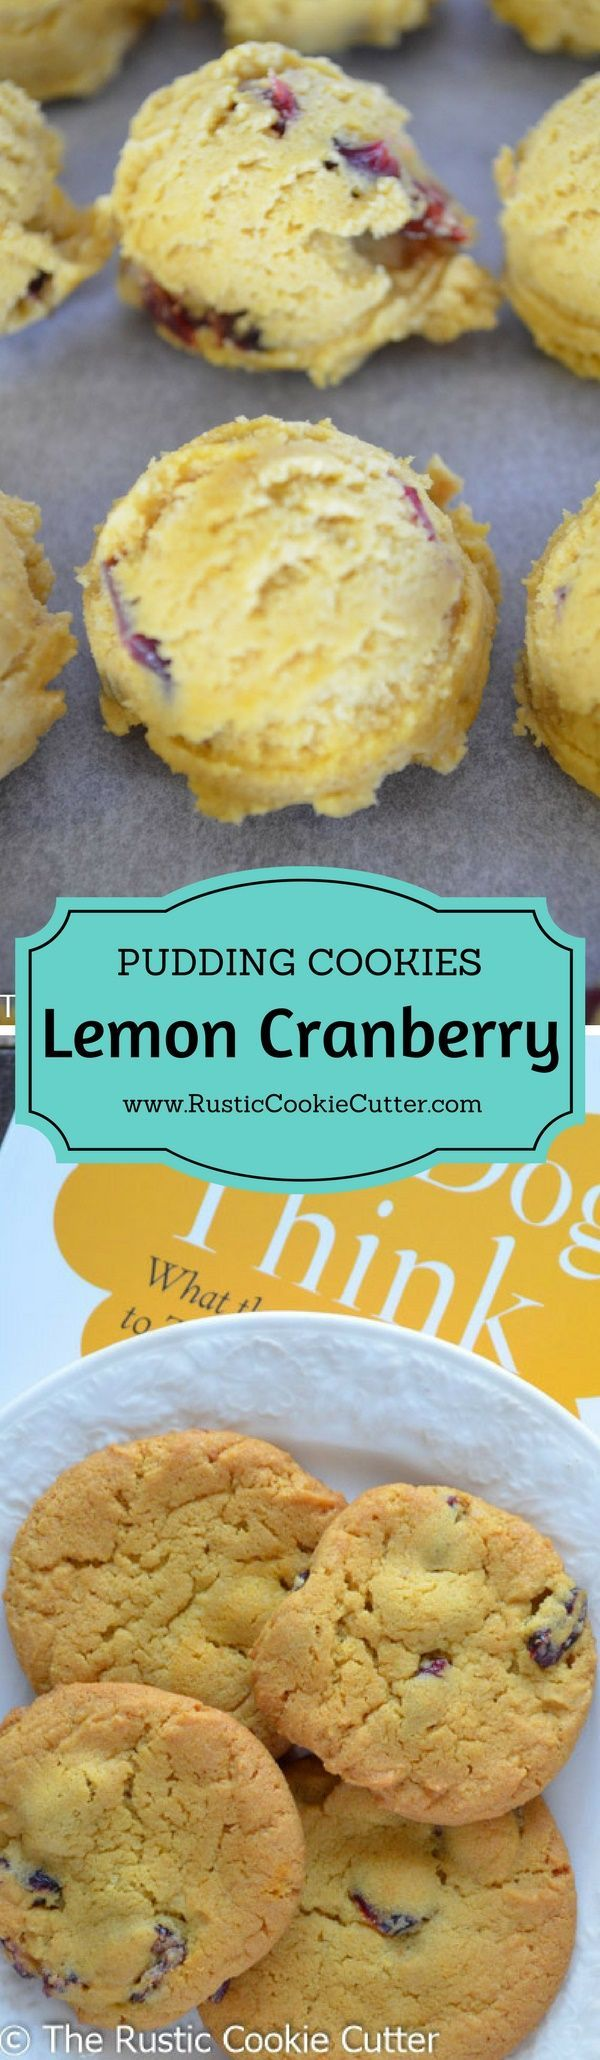 Super Soft & Chewy Lemon Pudding Cookies - Lemon Cranberry Pudding Cookies